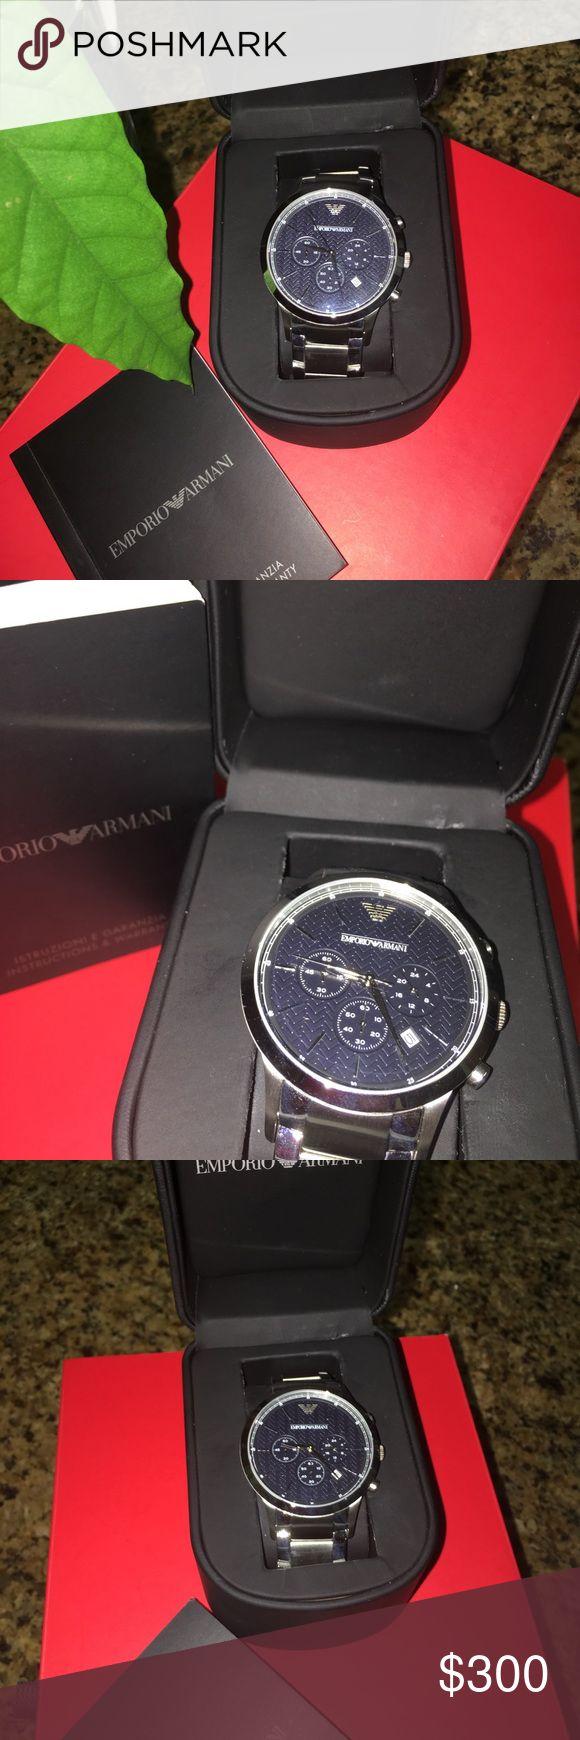 EMPORIO ARMANI WATCH Brand new with box Emporio Armani men watch . Emporio Armani Accessories Watches